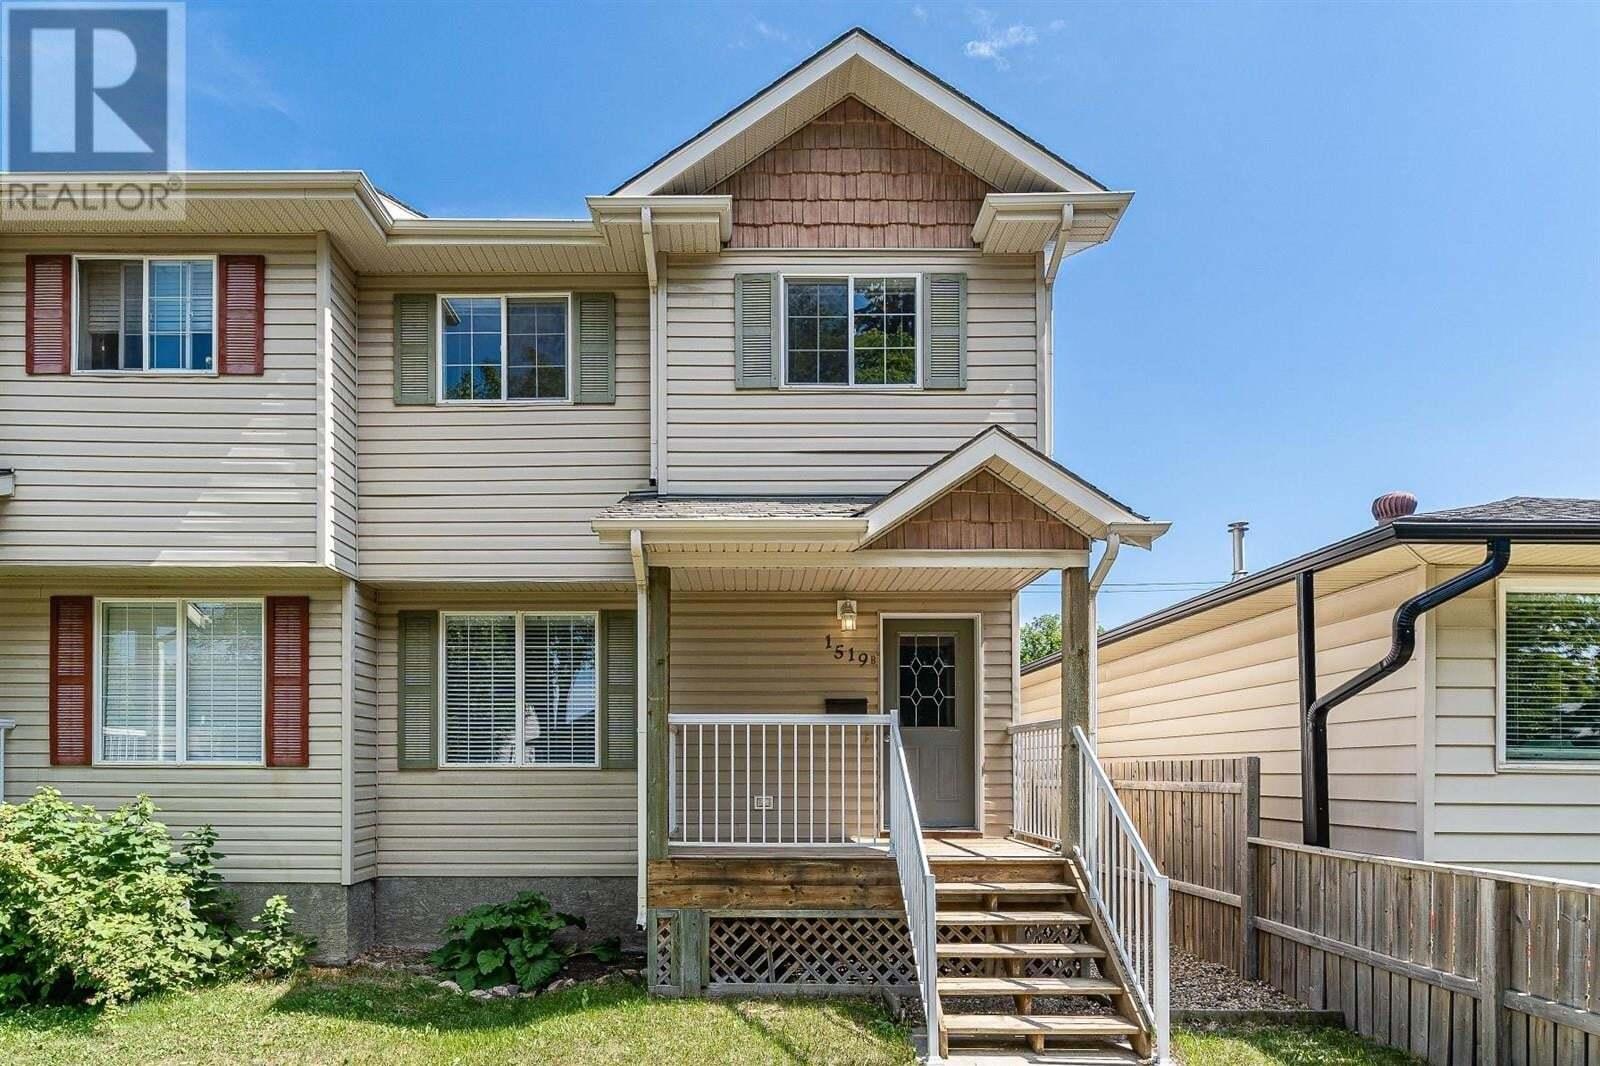 House for sale at 1519 Coy Ave Saskatoon Saskatchewan - MLS: SK819405